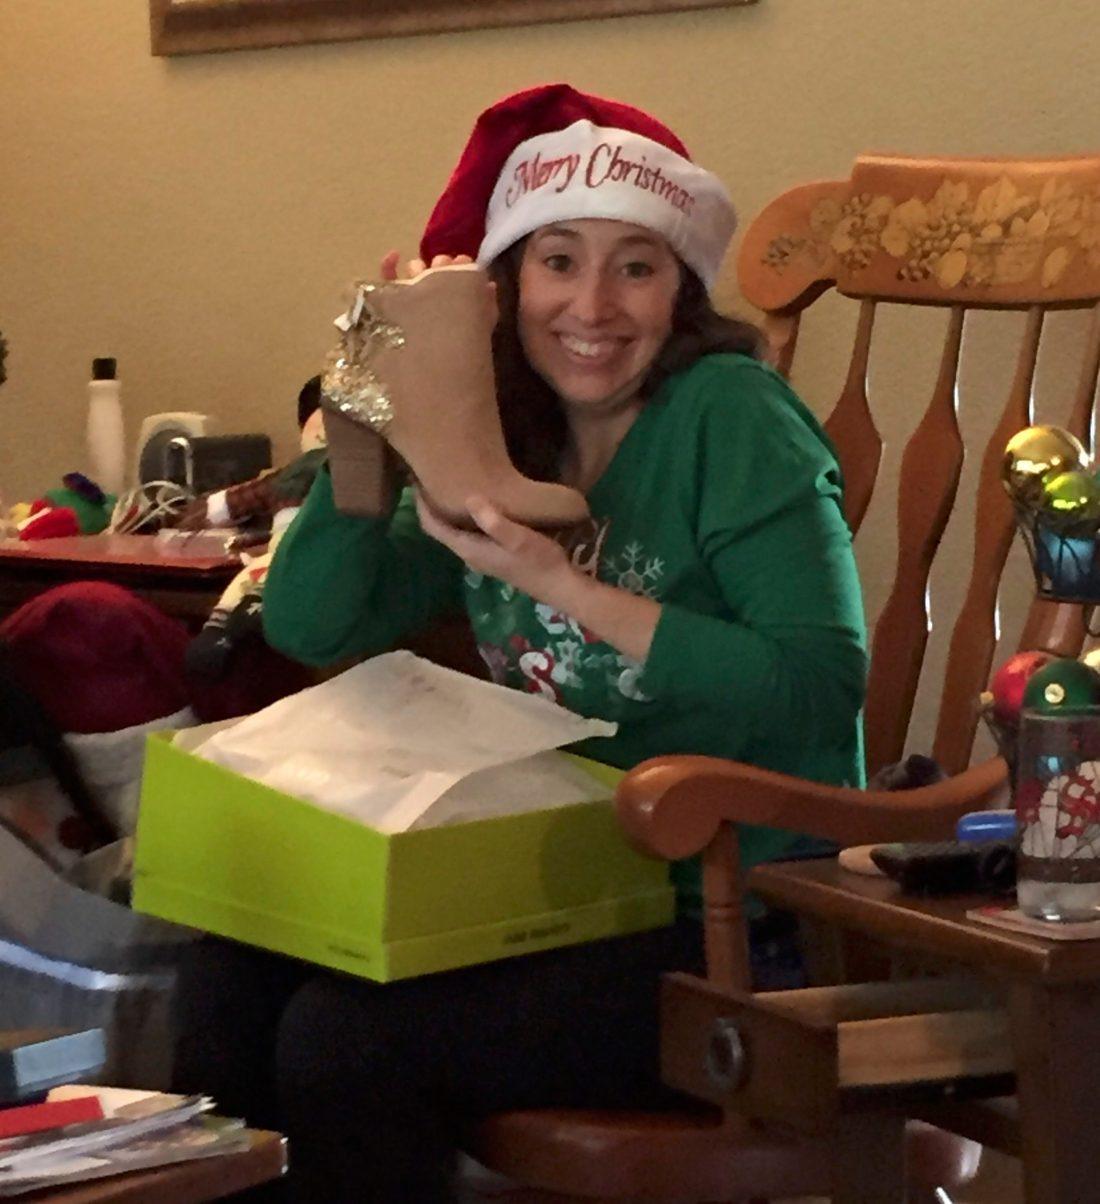 Santa hat and high-heeled boots.